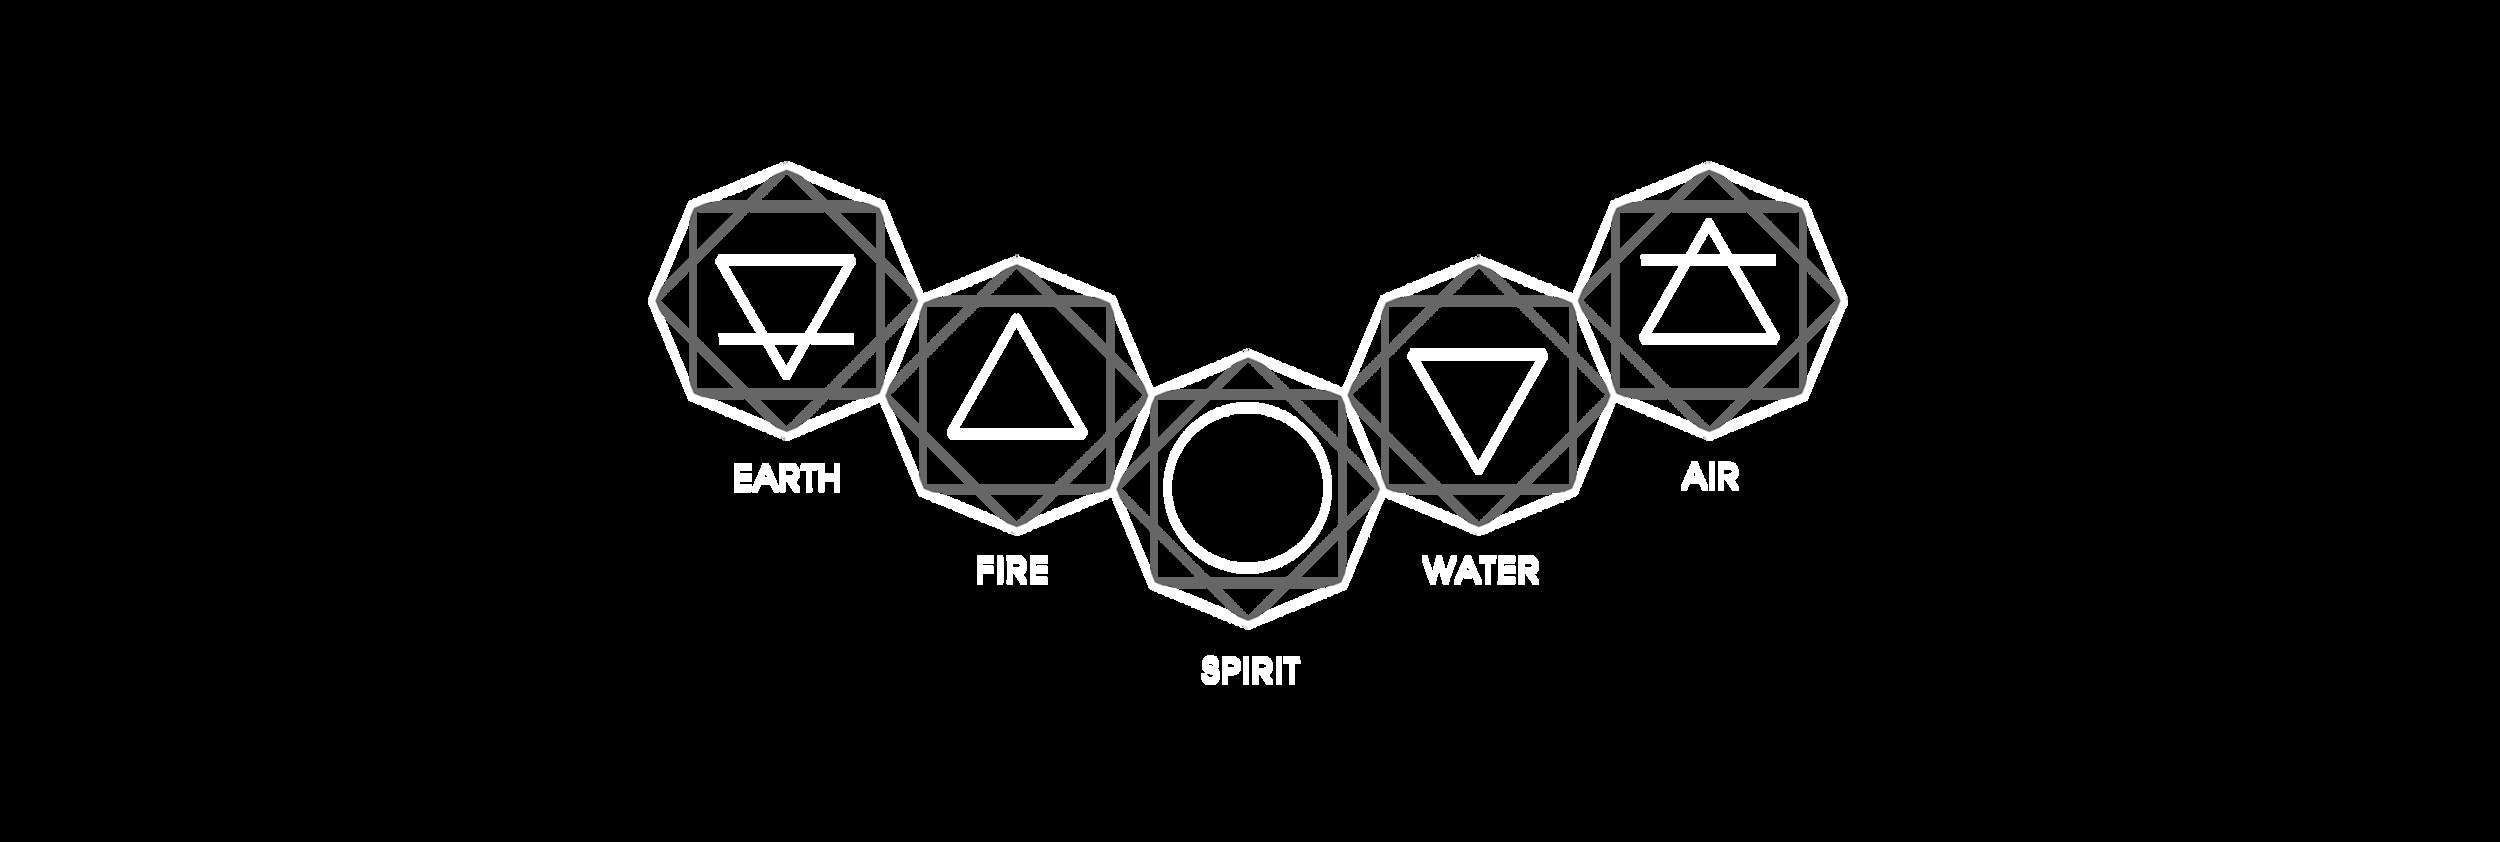 elements website3.png